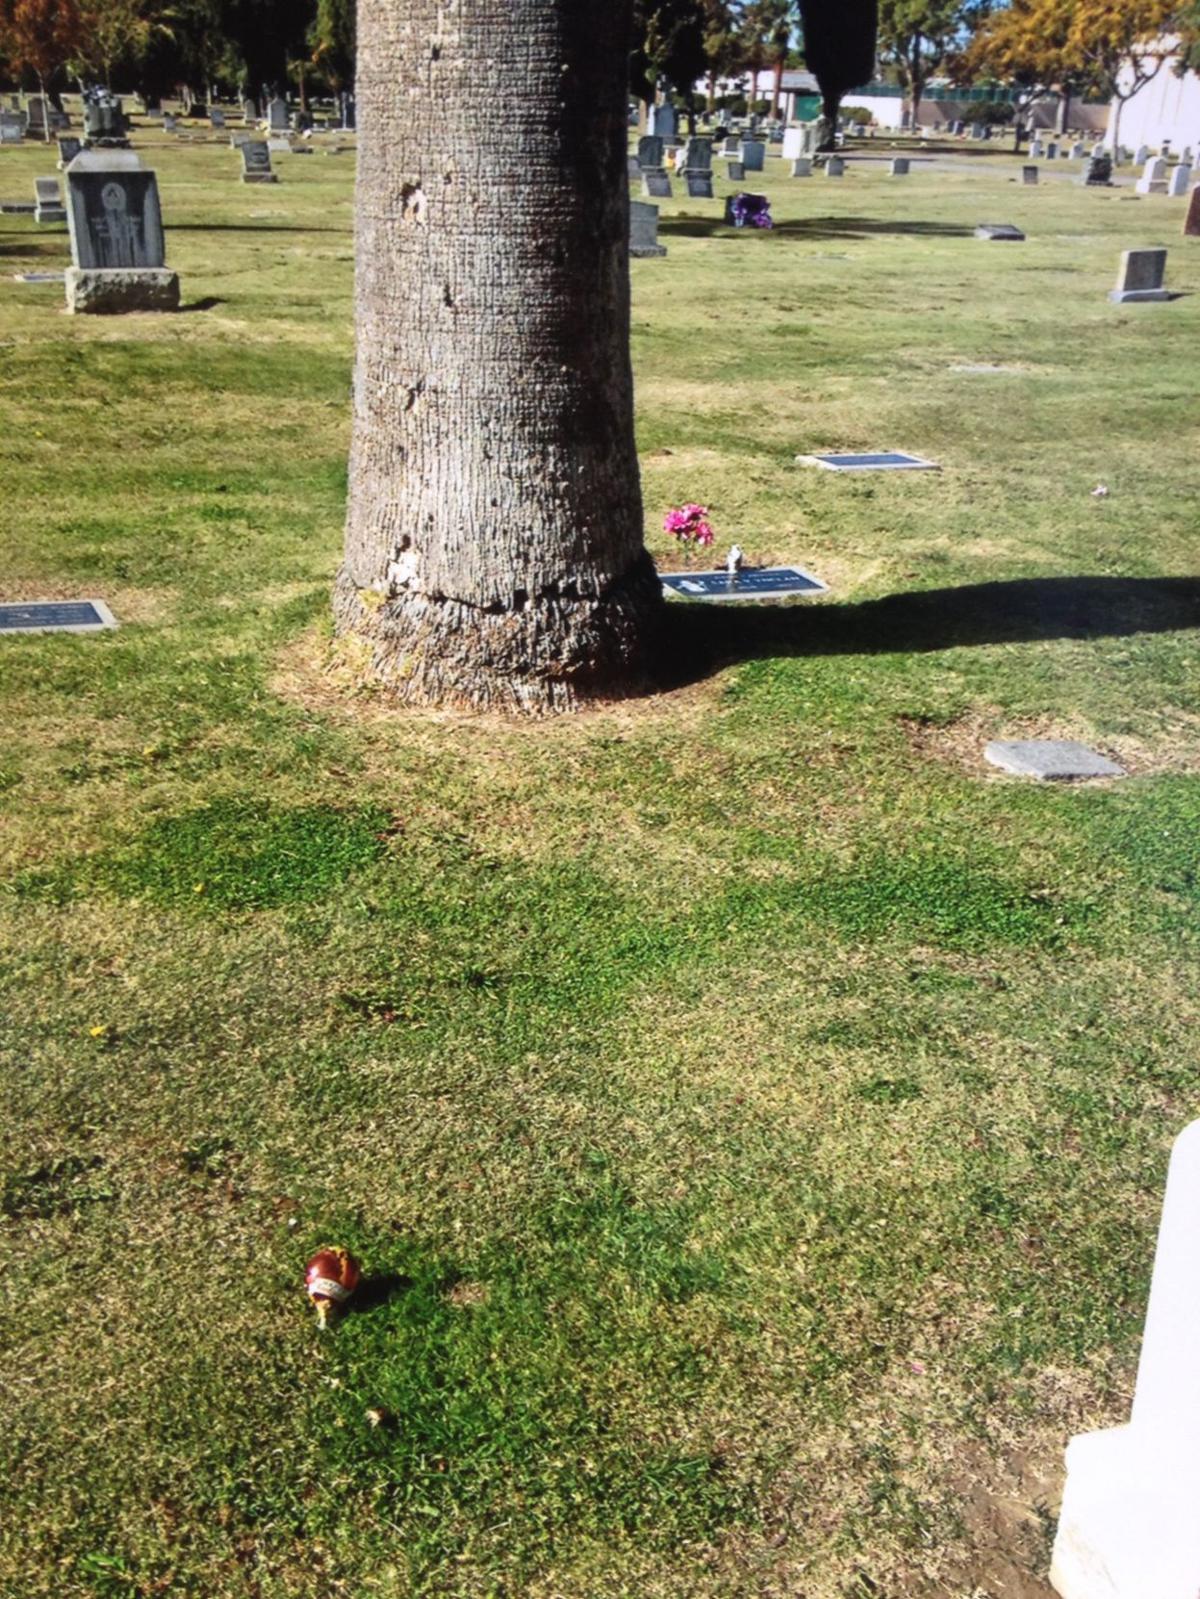 Bludworth grave